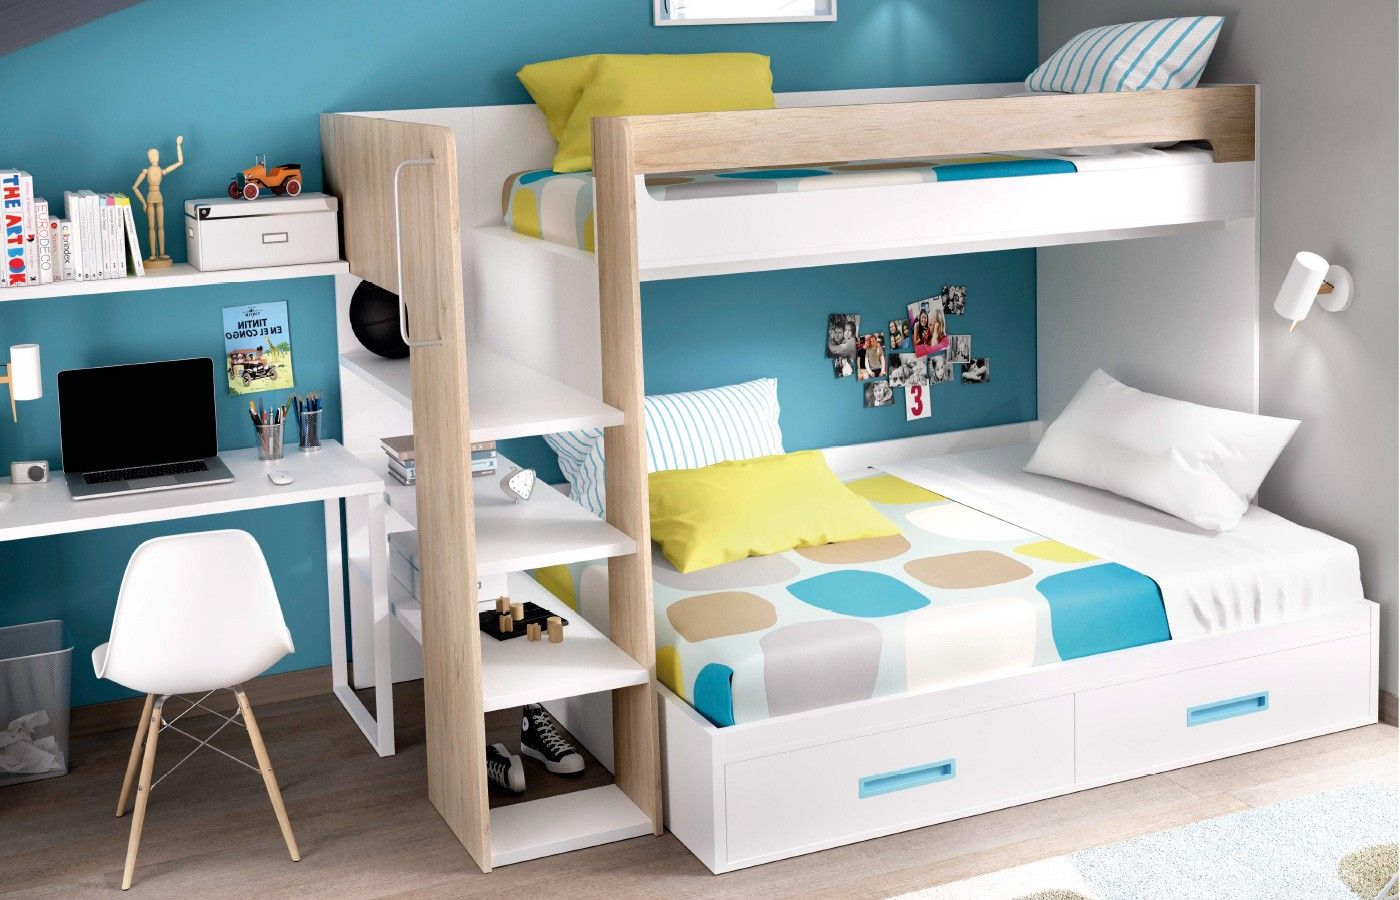 Litera mael dismobel habitaci n ni os pinterest for Dismobel muebles catalogo